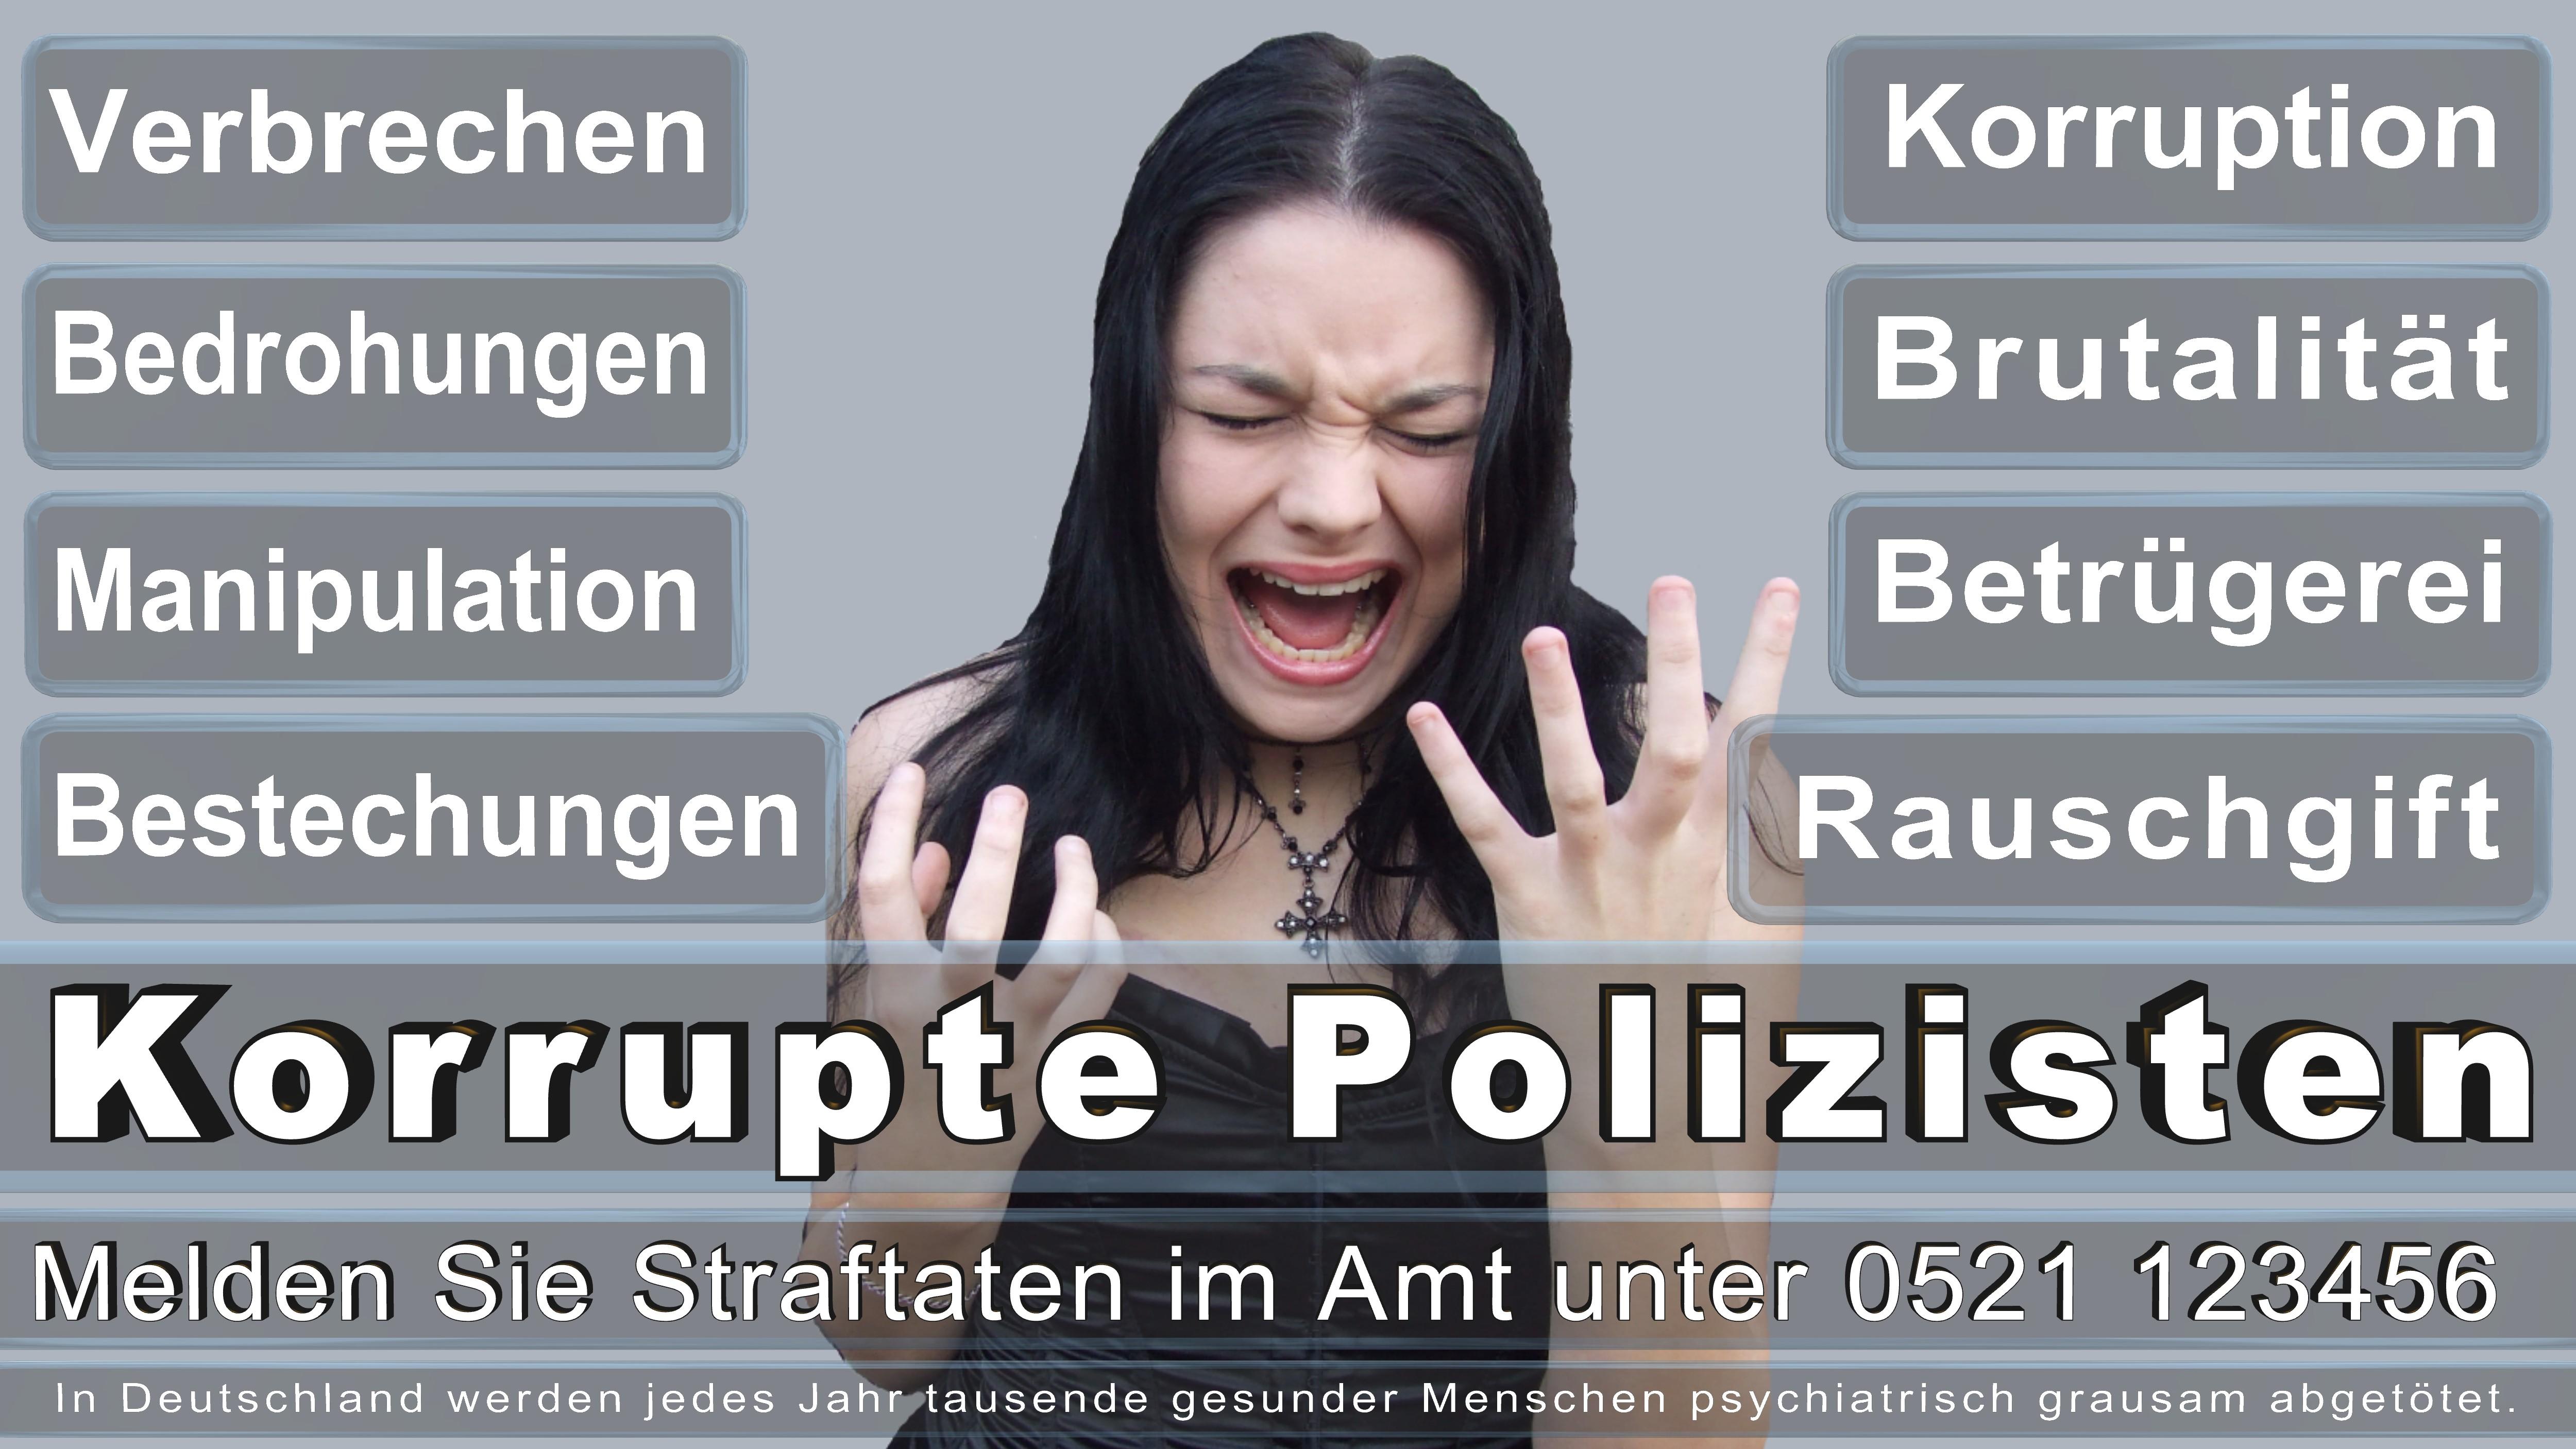 Polizei-Bielefeld-Polizei-Bielefeld-Polizei-Bielefeld (207)